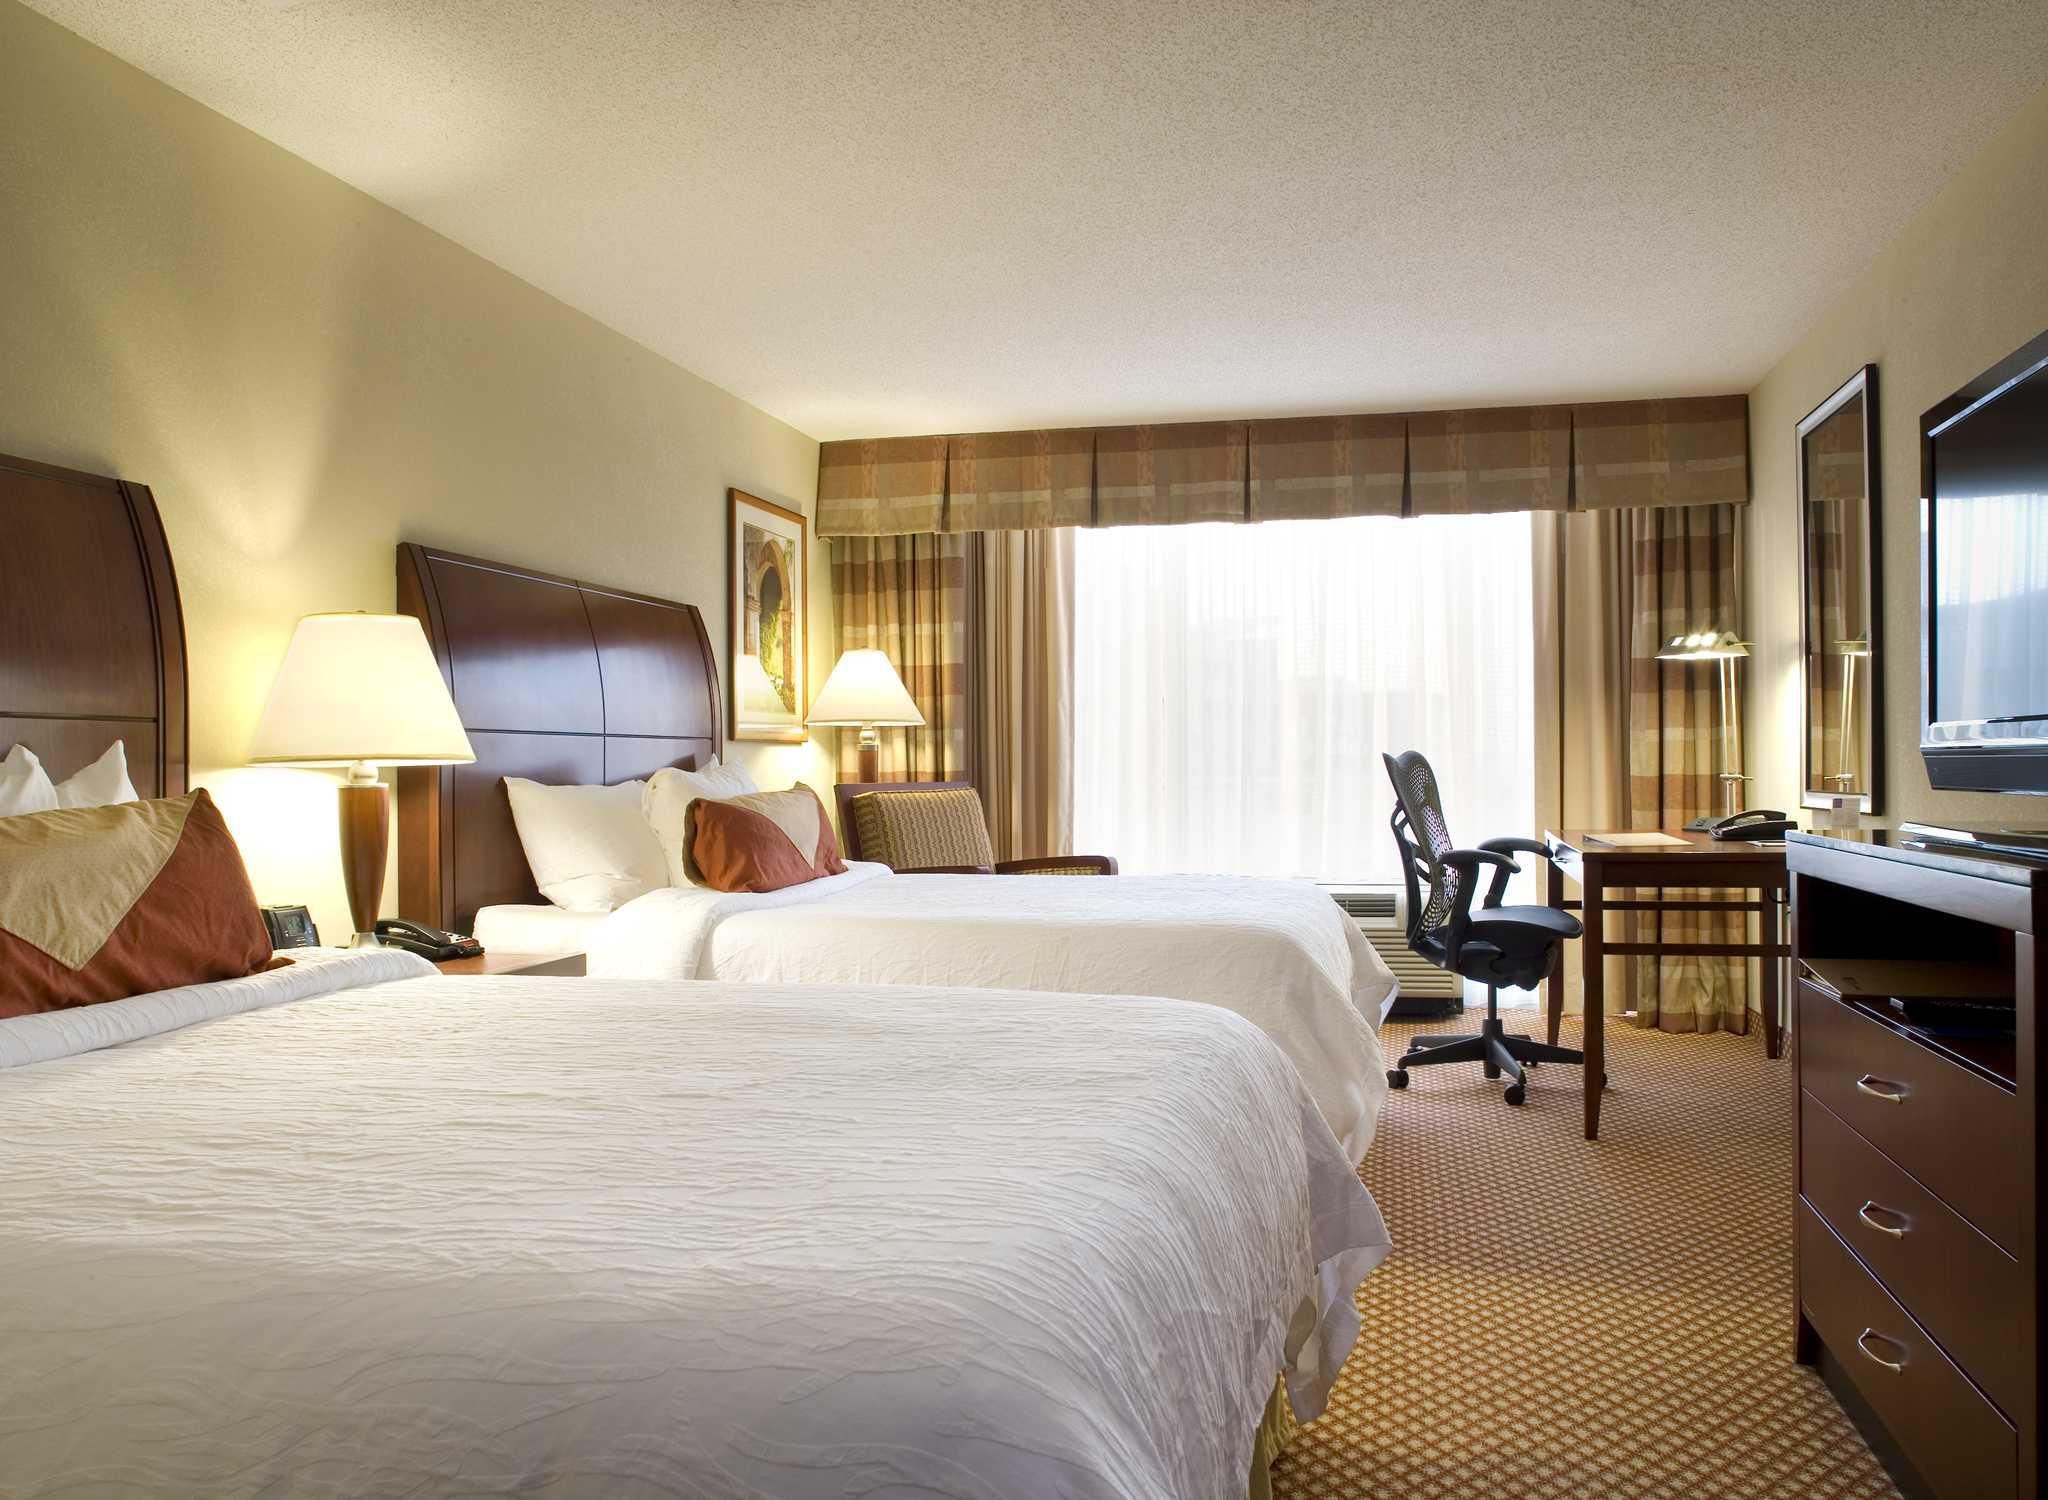 Nashville 2 Bedroom Suites Hilton Garden Inn Nashville Vanderbilt On Broadway